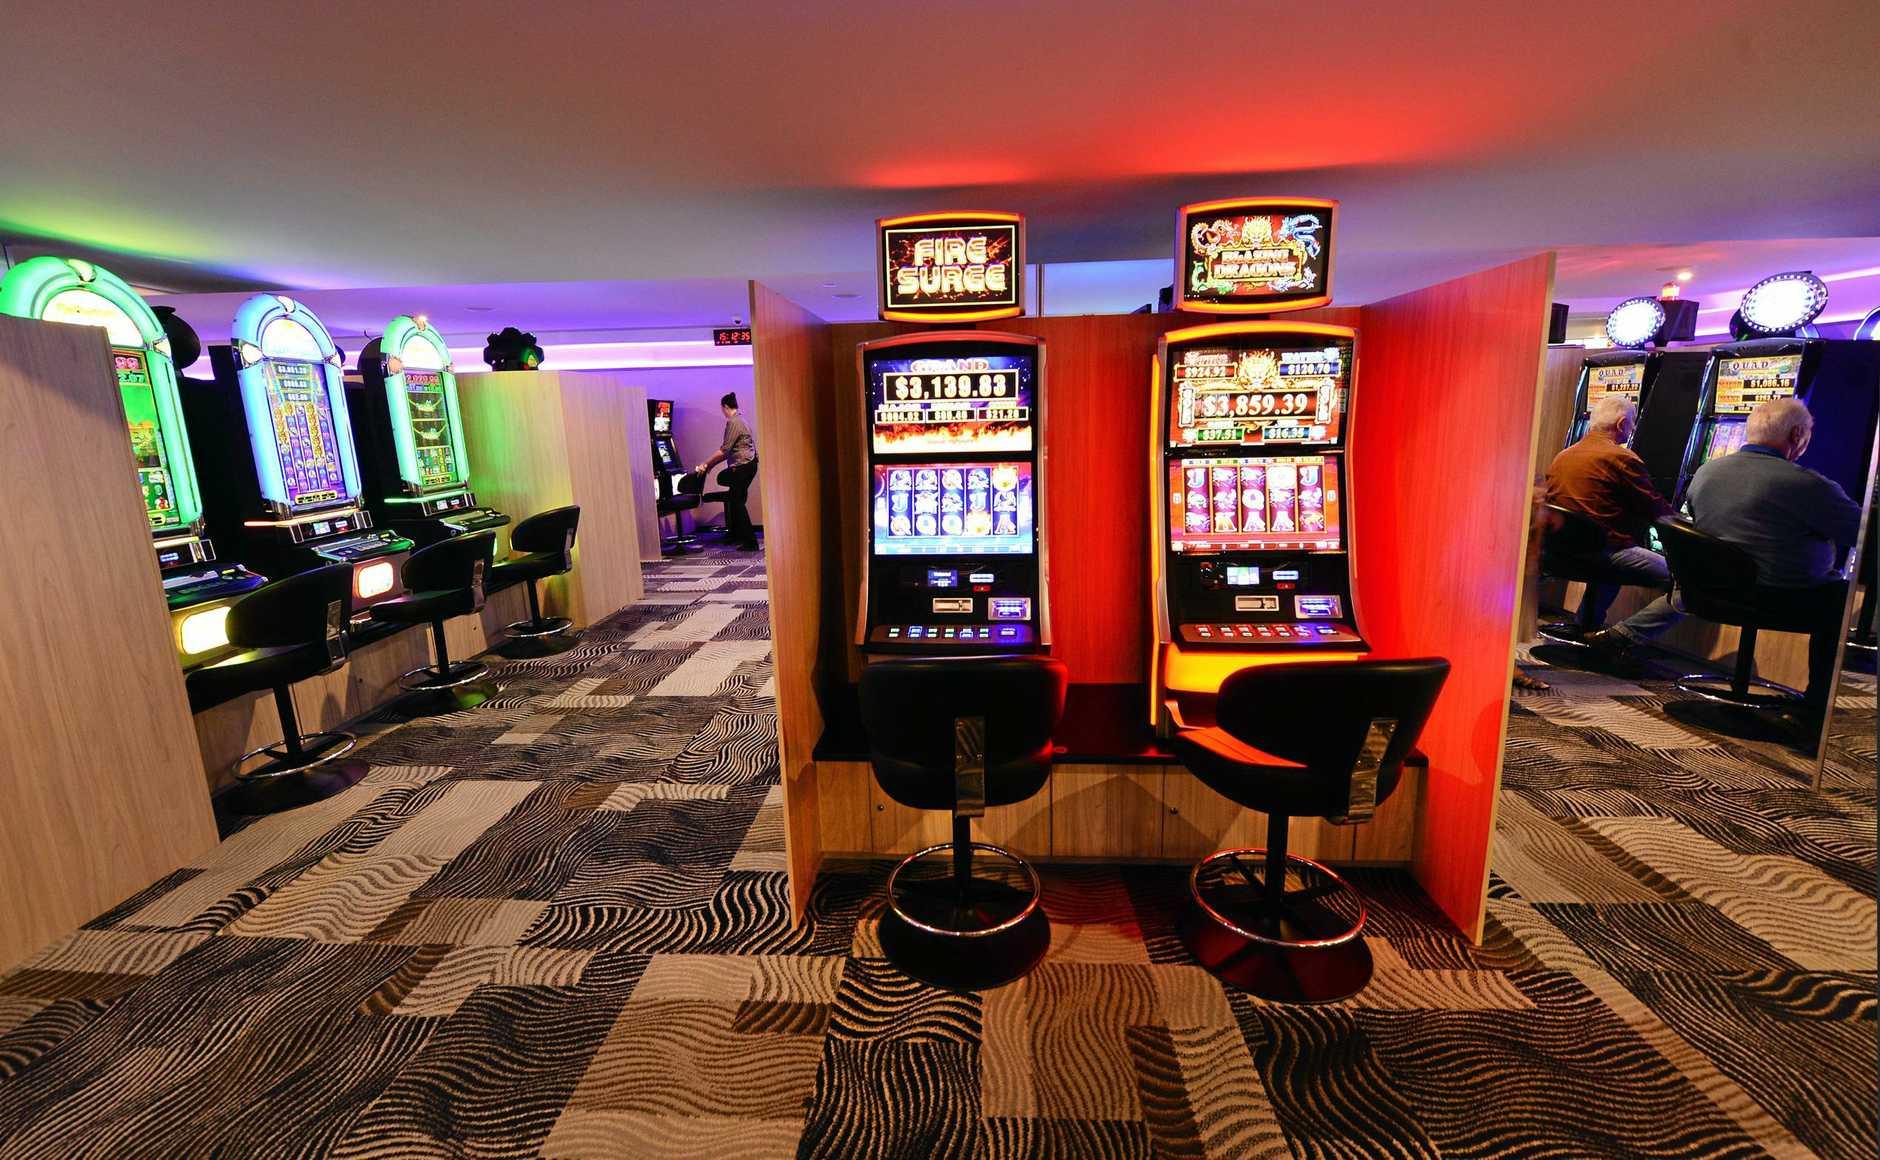 CSI (Club Services Ipswich) poker machine gaming area.